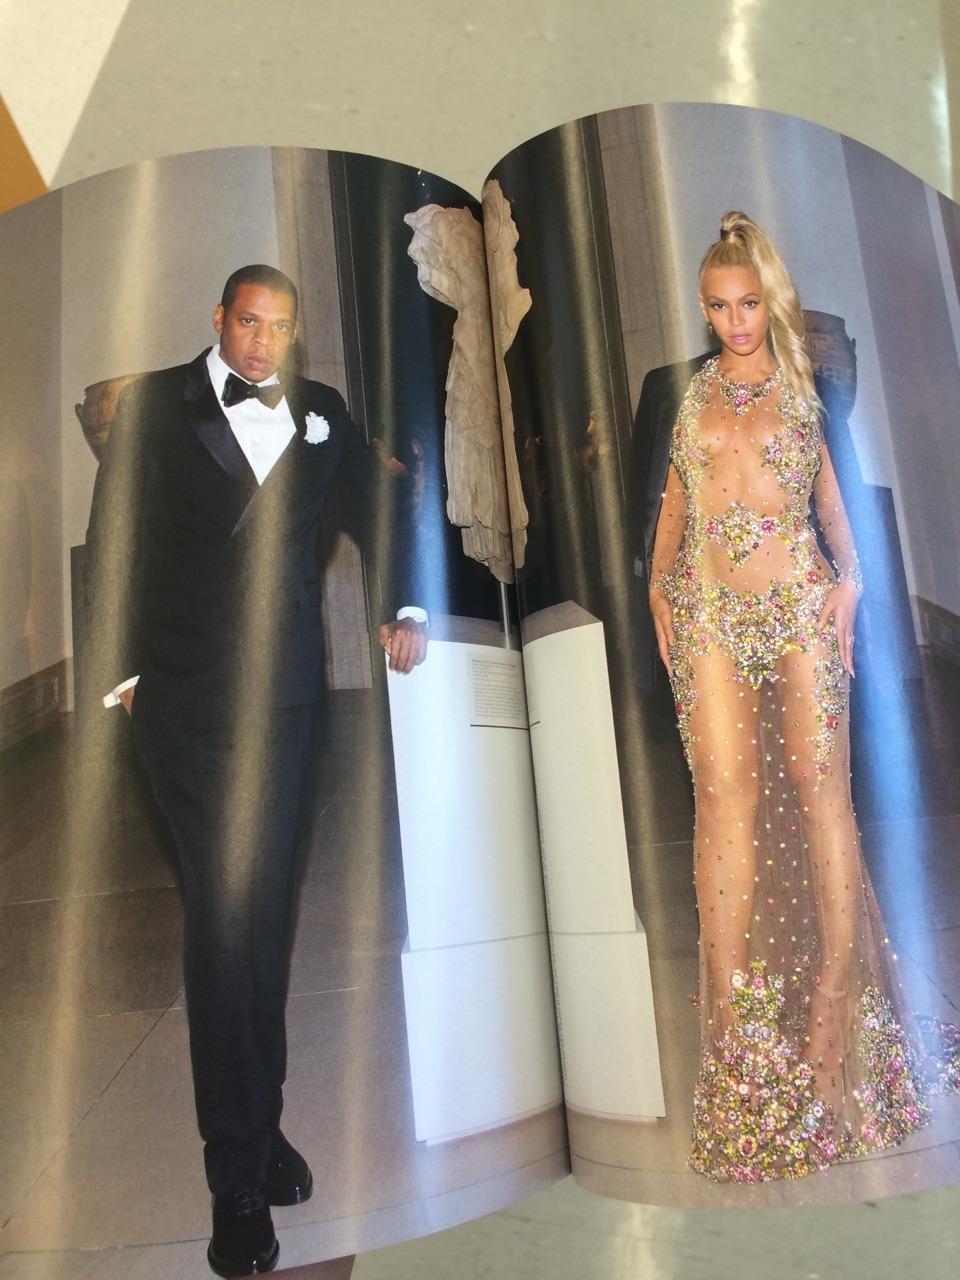 Fotos de Beyoncé > Nuevos Shoots, Campañas, Portadas, etc. - Página 44 Tumblr_ntntjx8olq1ryqnclo1_1280